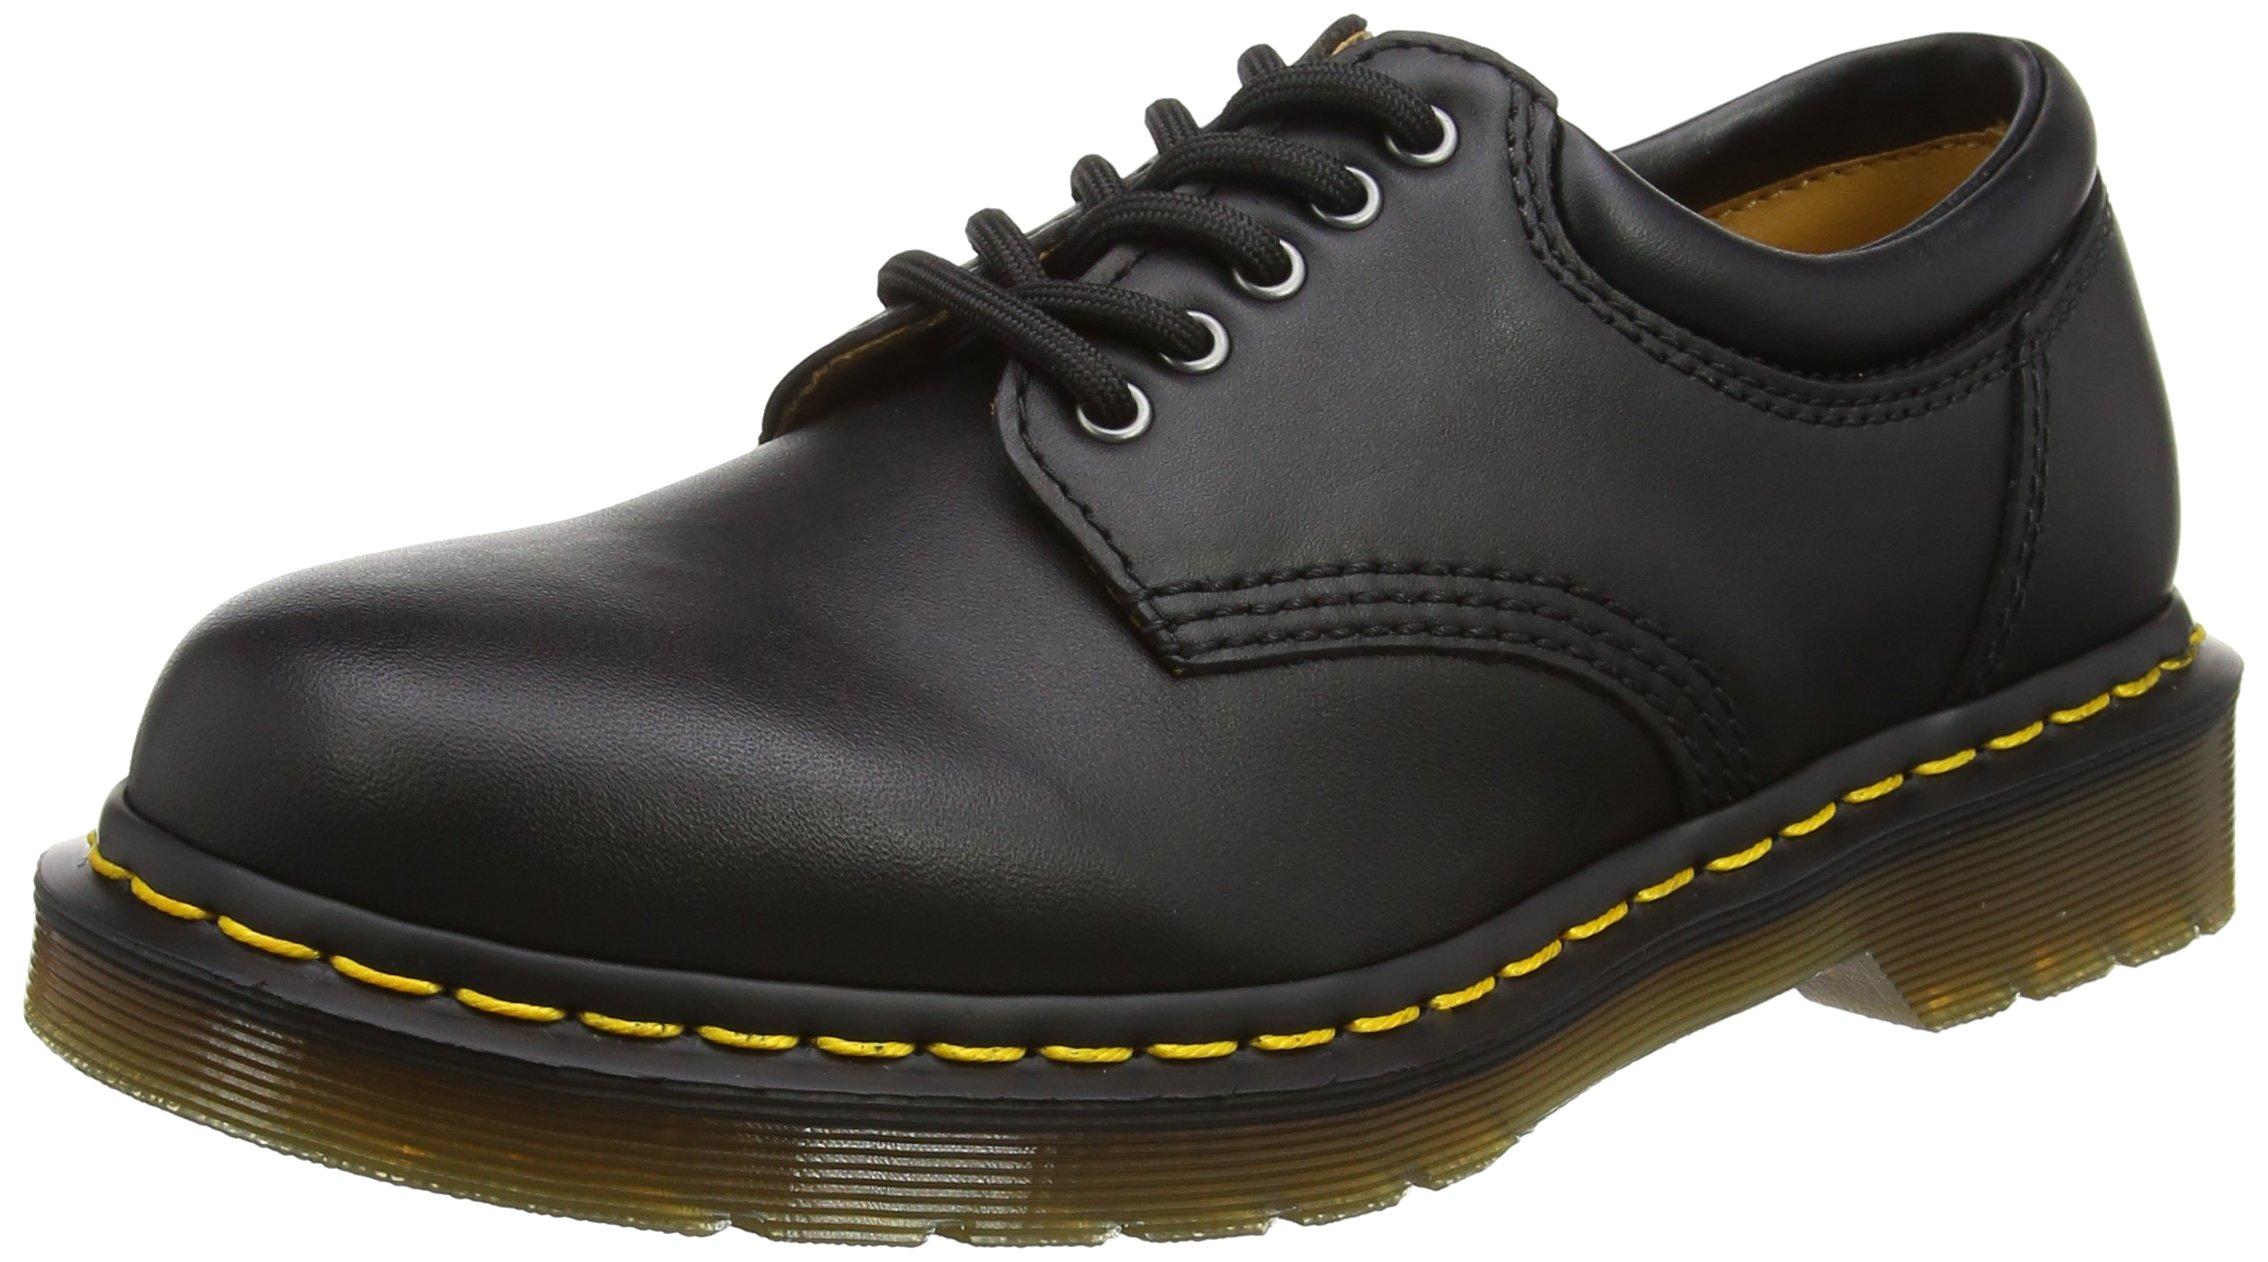 R11849001 Dr. Marten Unisex Iconic Casual Shoes - Black 9 UK 10 US